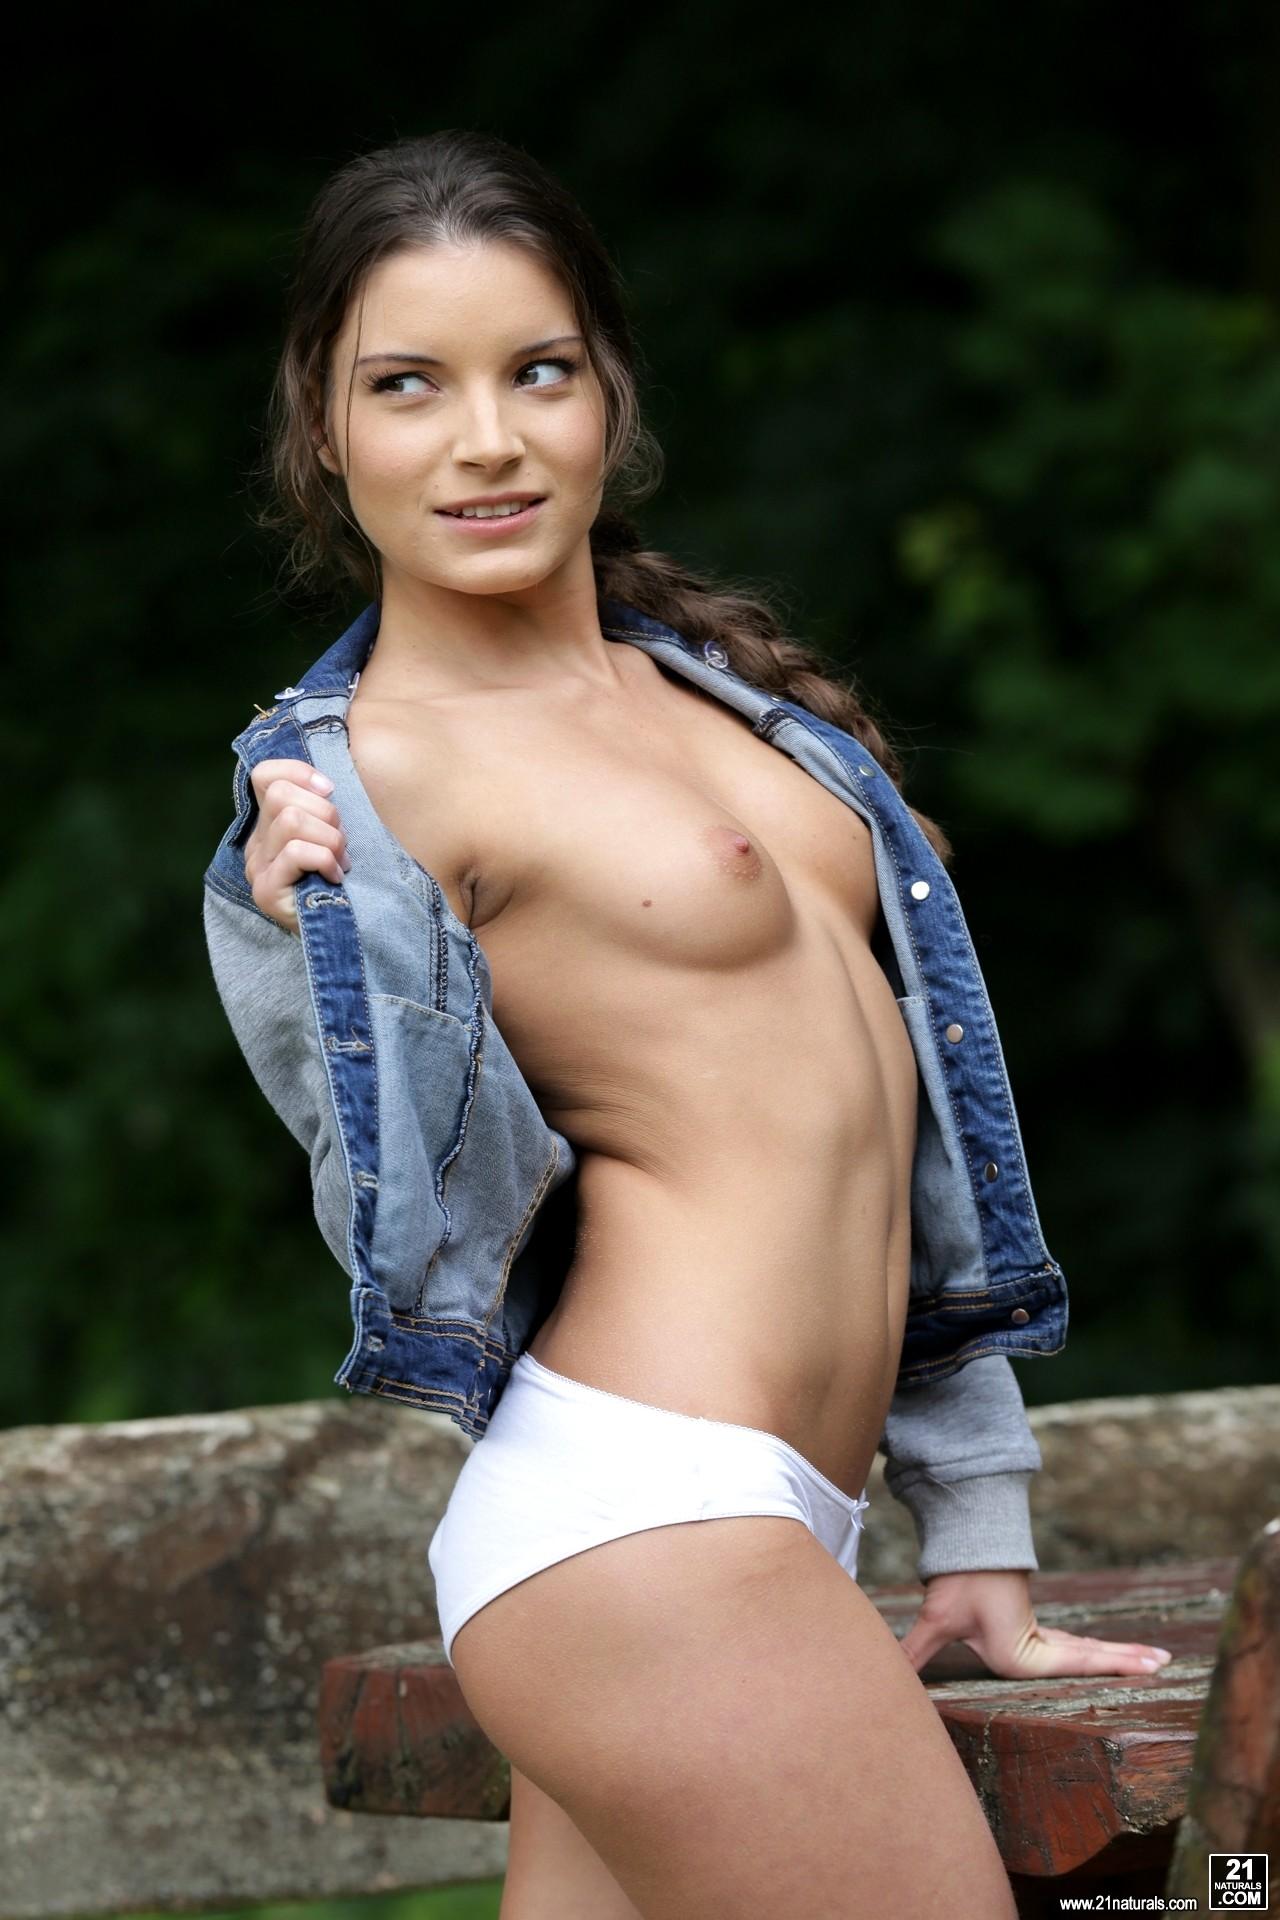 21 Naturals Anita Bellini Porn 21sextury anita bellini only anal porn nurse free pornpics